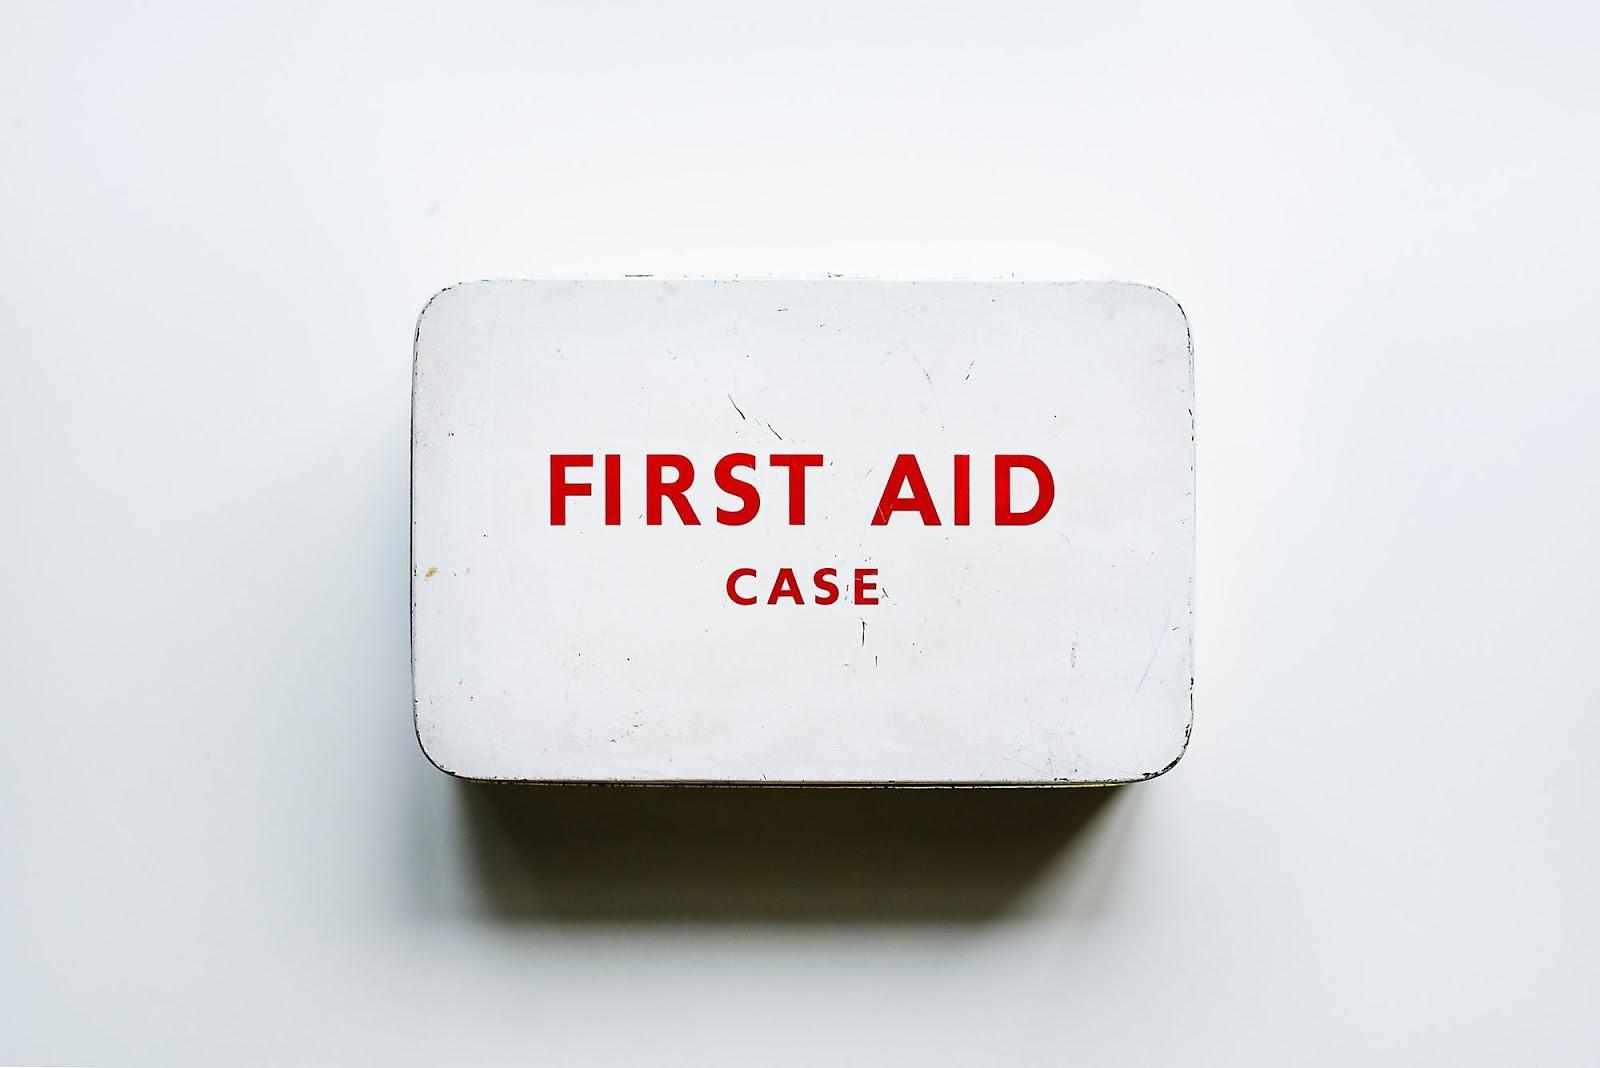 Visita Iglesia tip: bring a medicine kit